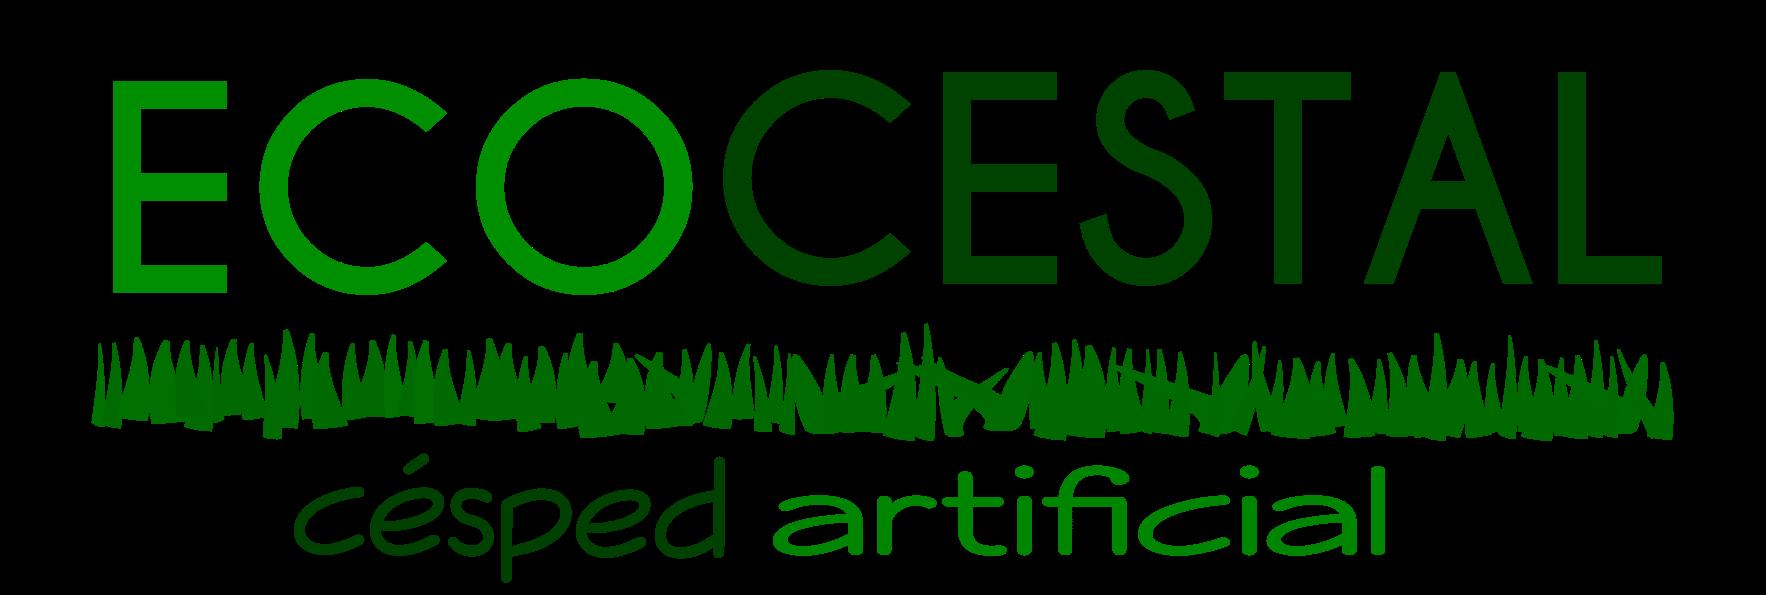 Logo Ecocestal, S.L.